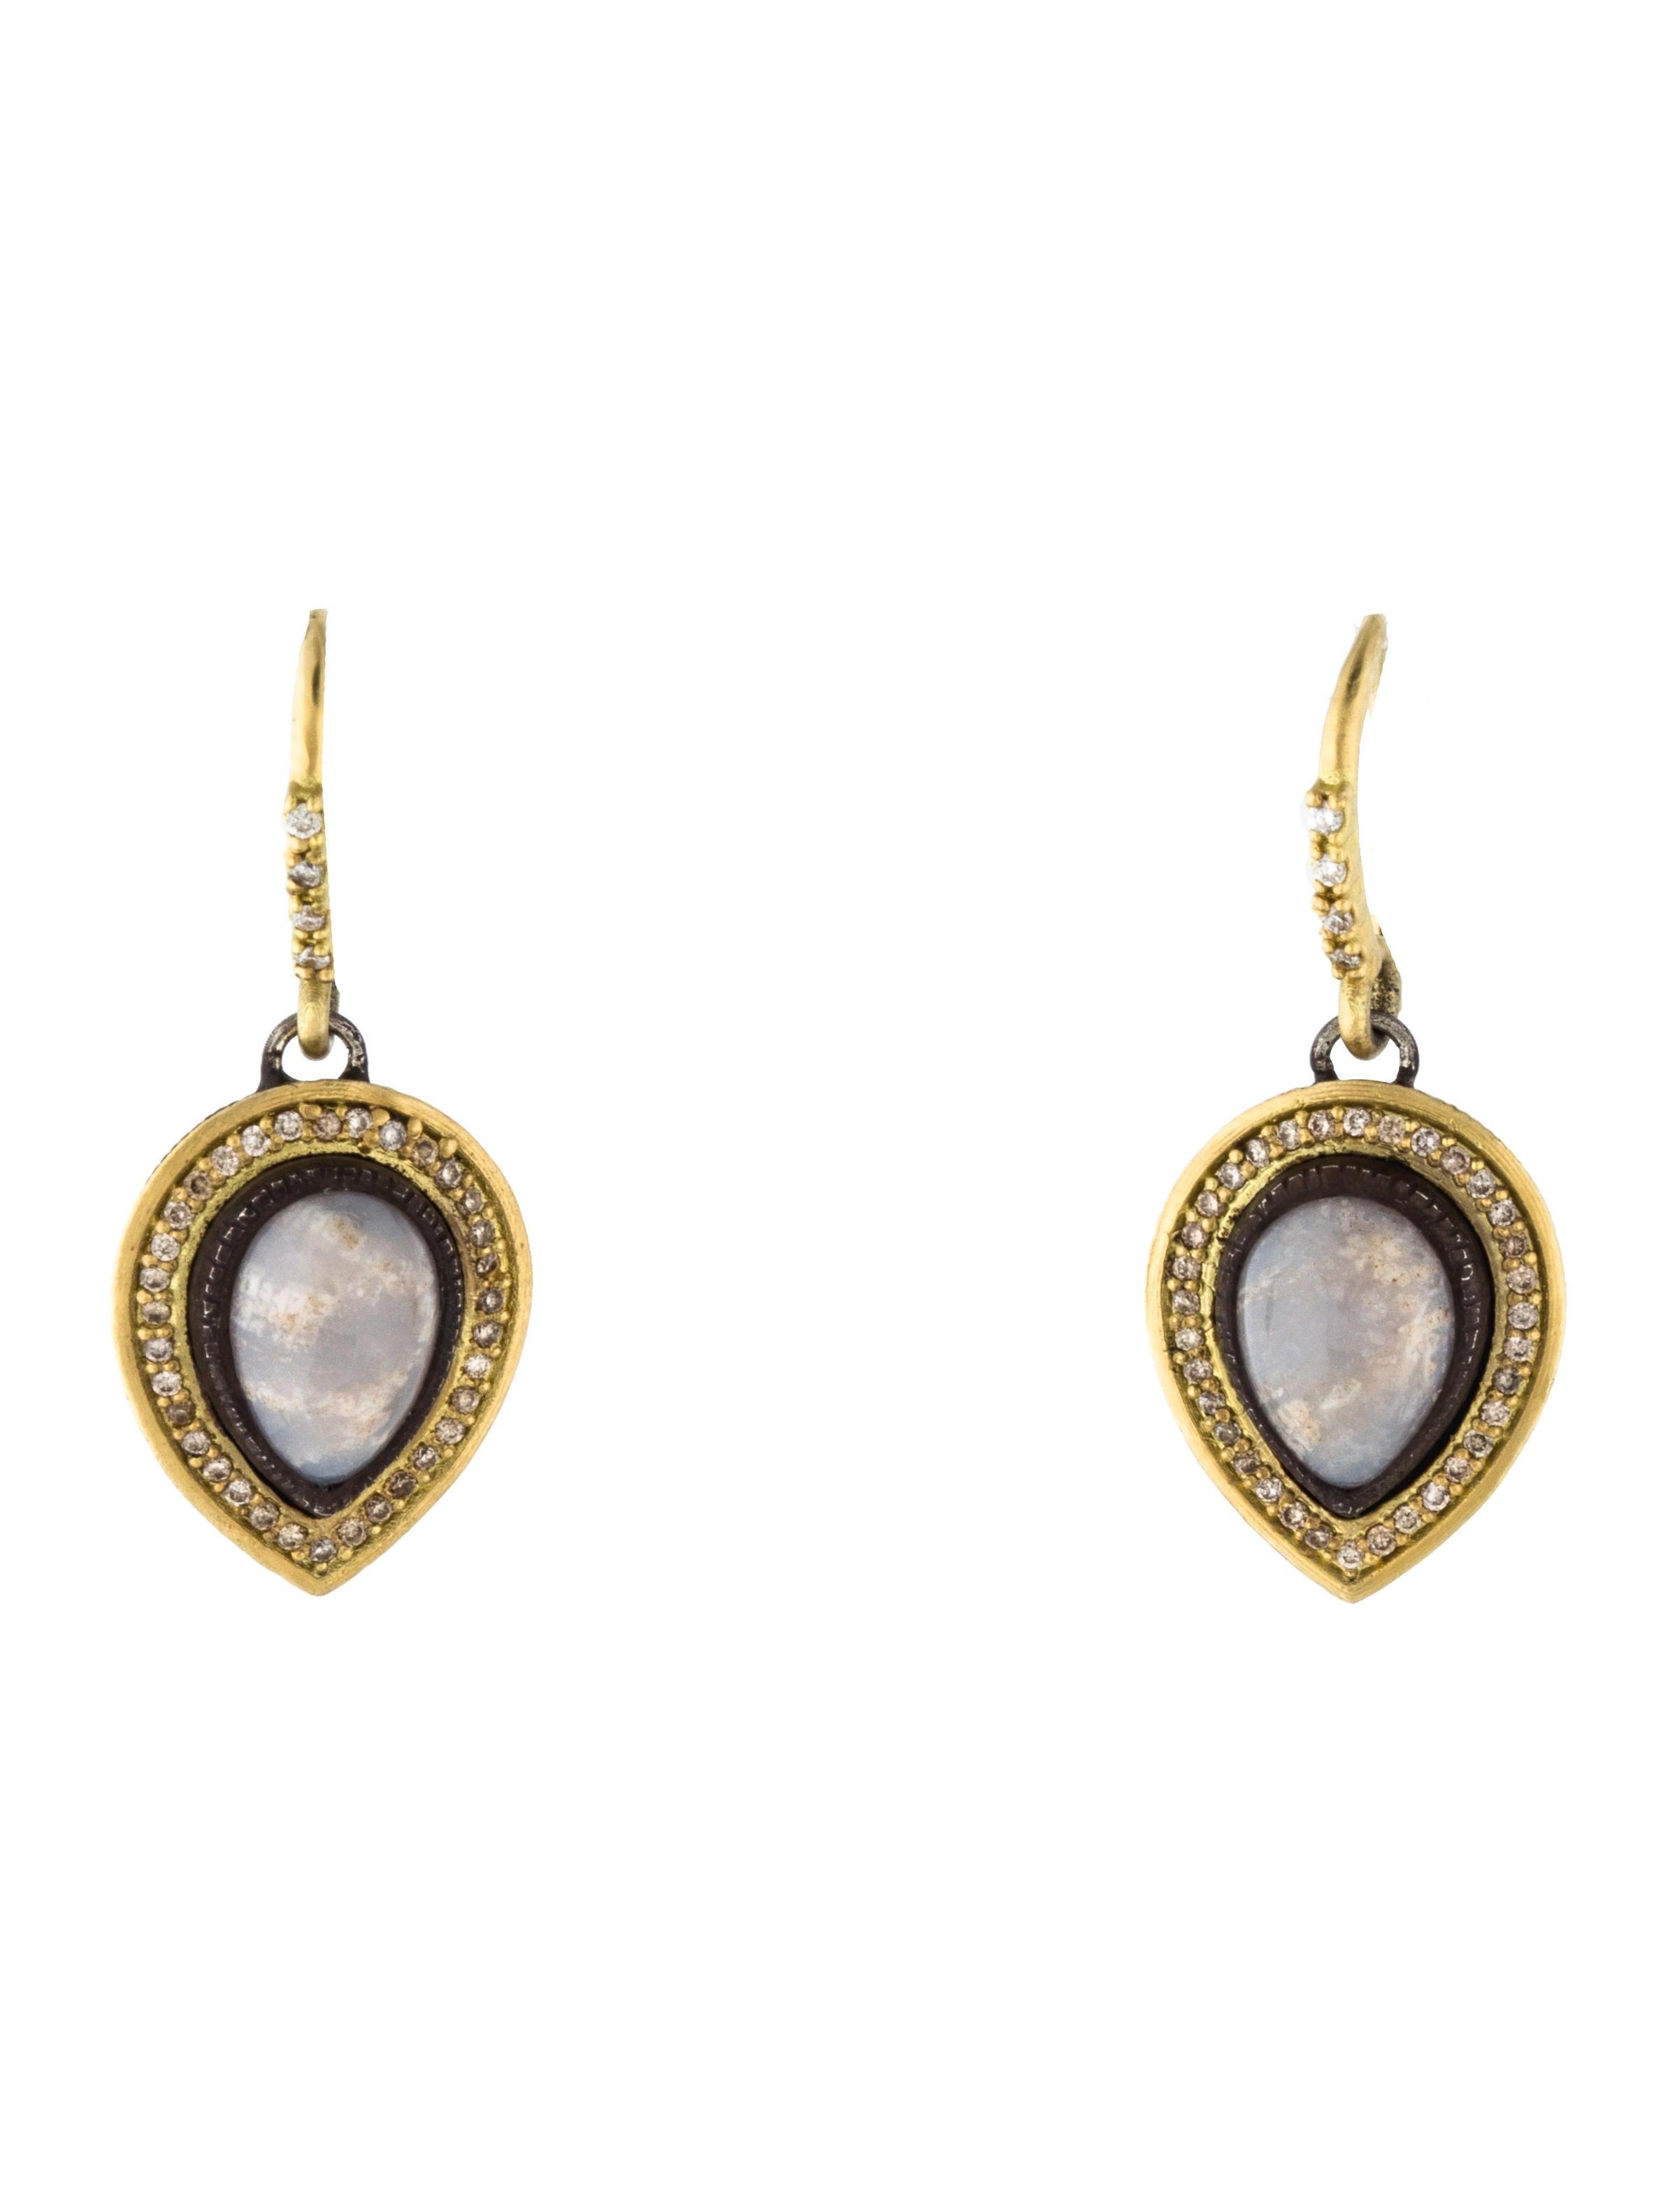 Armenta Old World Chalcedony Drop Earrings pVIUzOgK2O